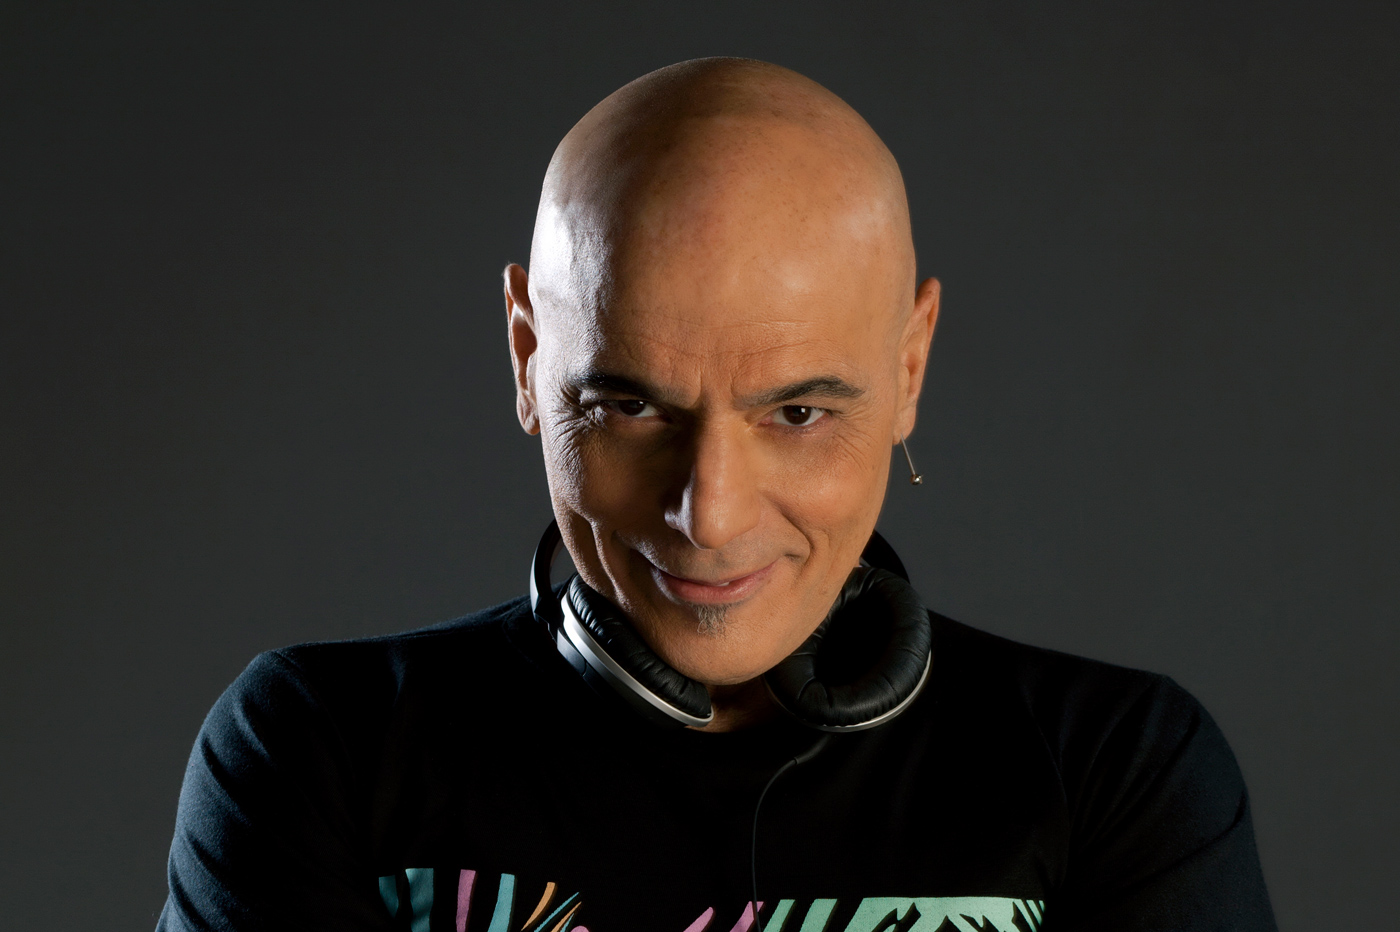 Zeta Bosio, bajista de Soda Stereo